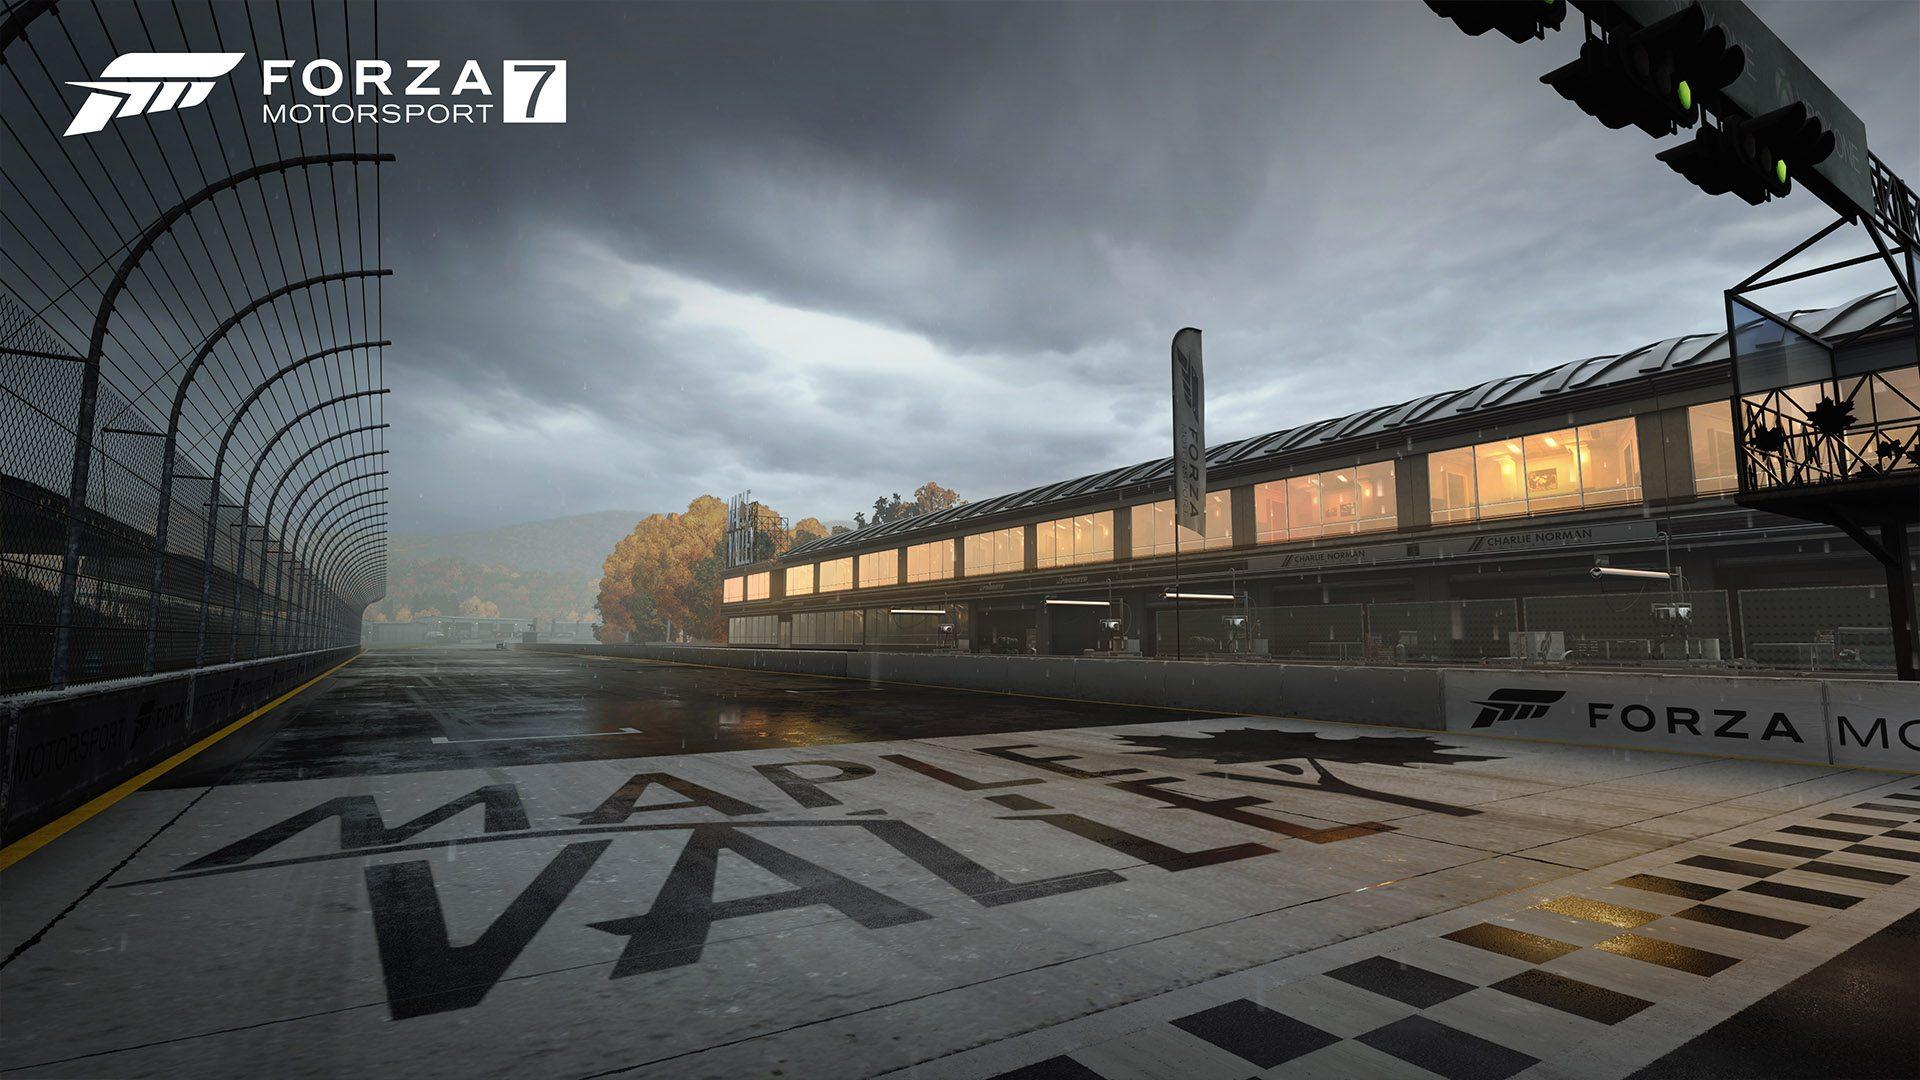 XBOX360 Forza Horizon 2 2014LT30  gigtorrentru